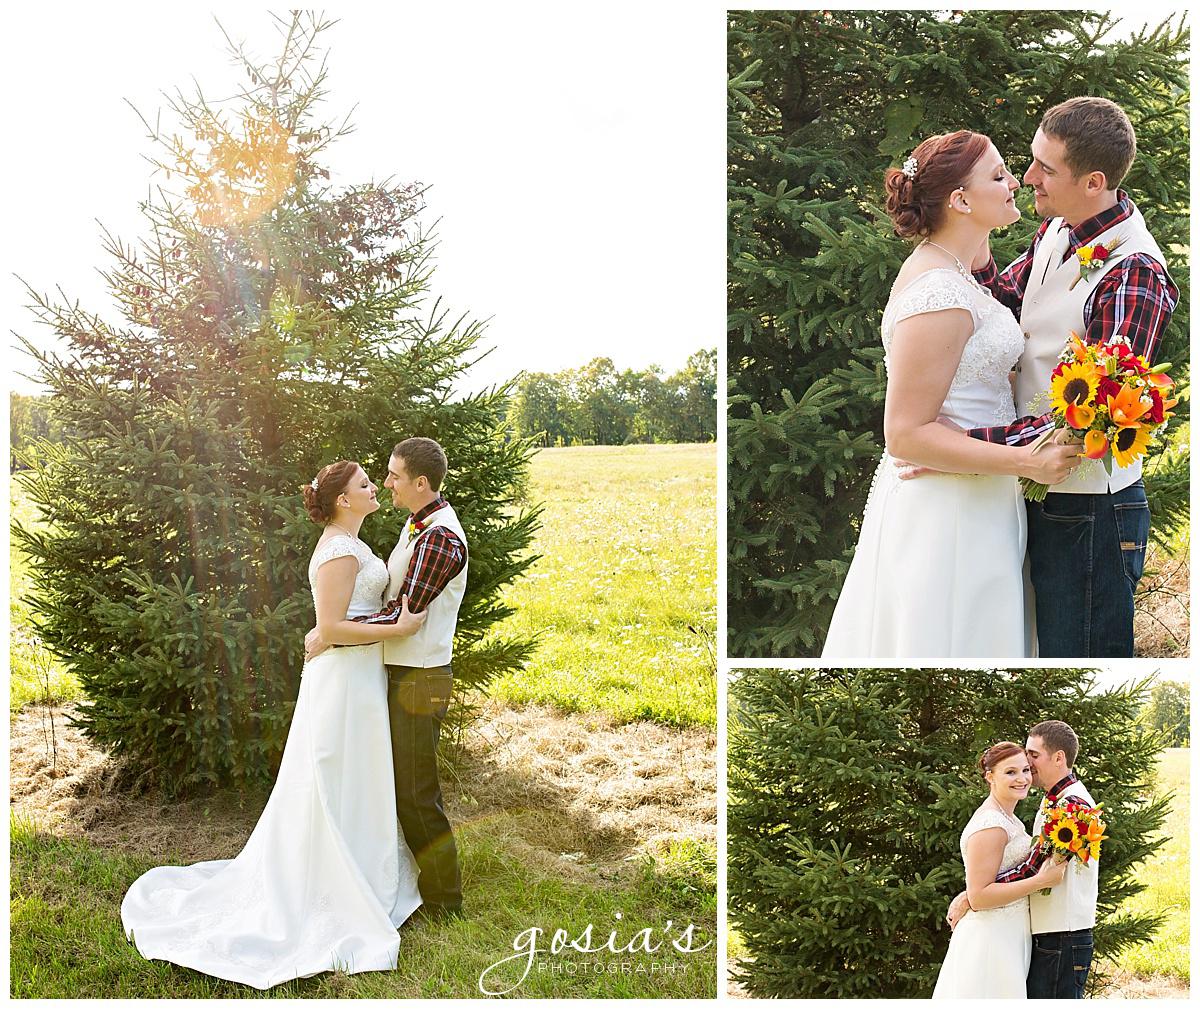 Gosias-Photography-wedding-photographer-Appleton-Homestead-Meadows-outdoor-ceremony-reception-Rachel-Zach-_0019.jpg